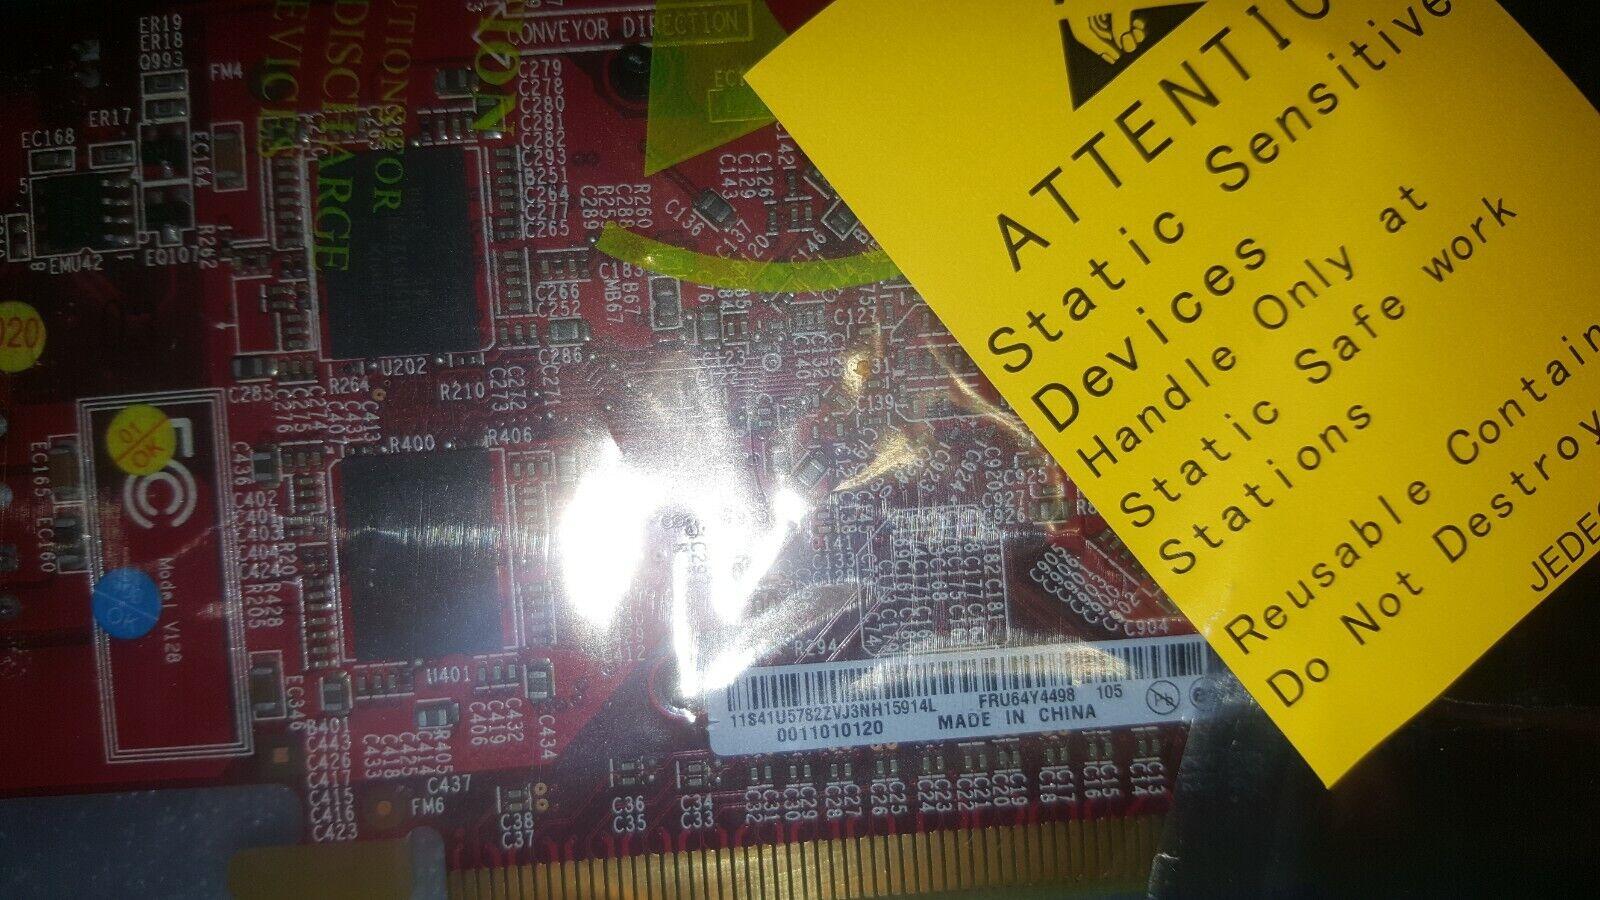 IBM / Lenovo ATI Radeon HD 3470 64Y4498 256MB VGA Display Port PCIe LOW PROFILE